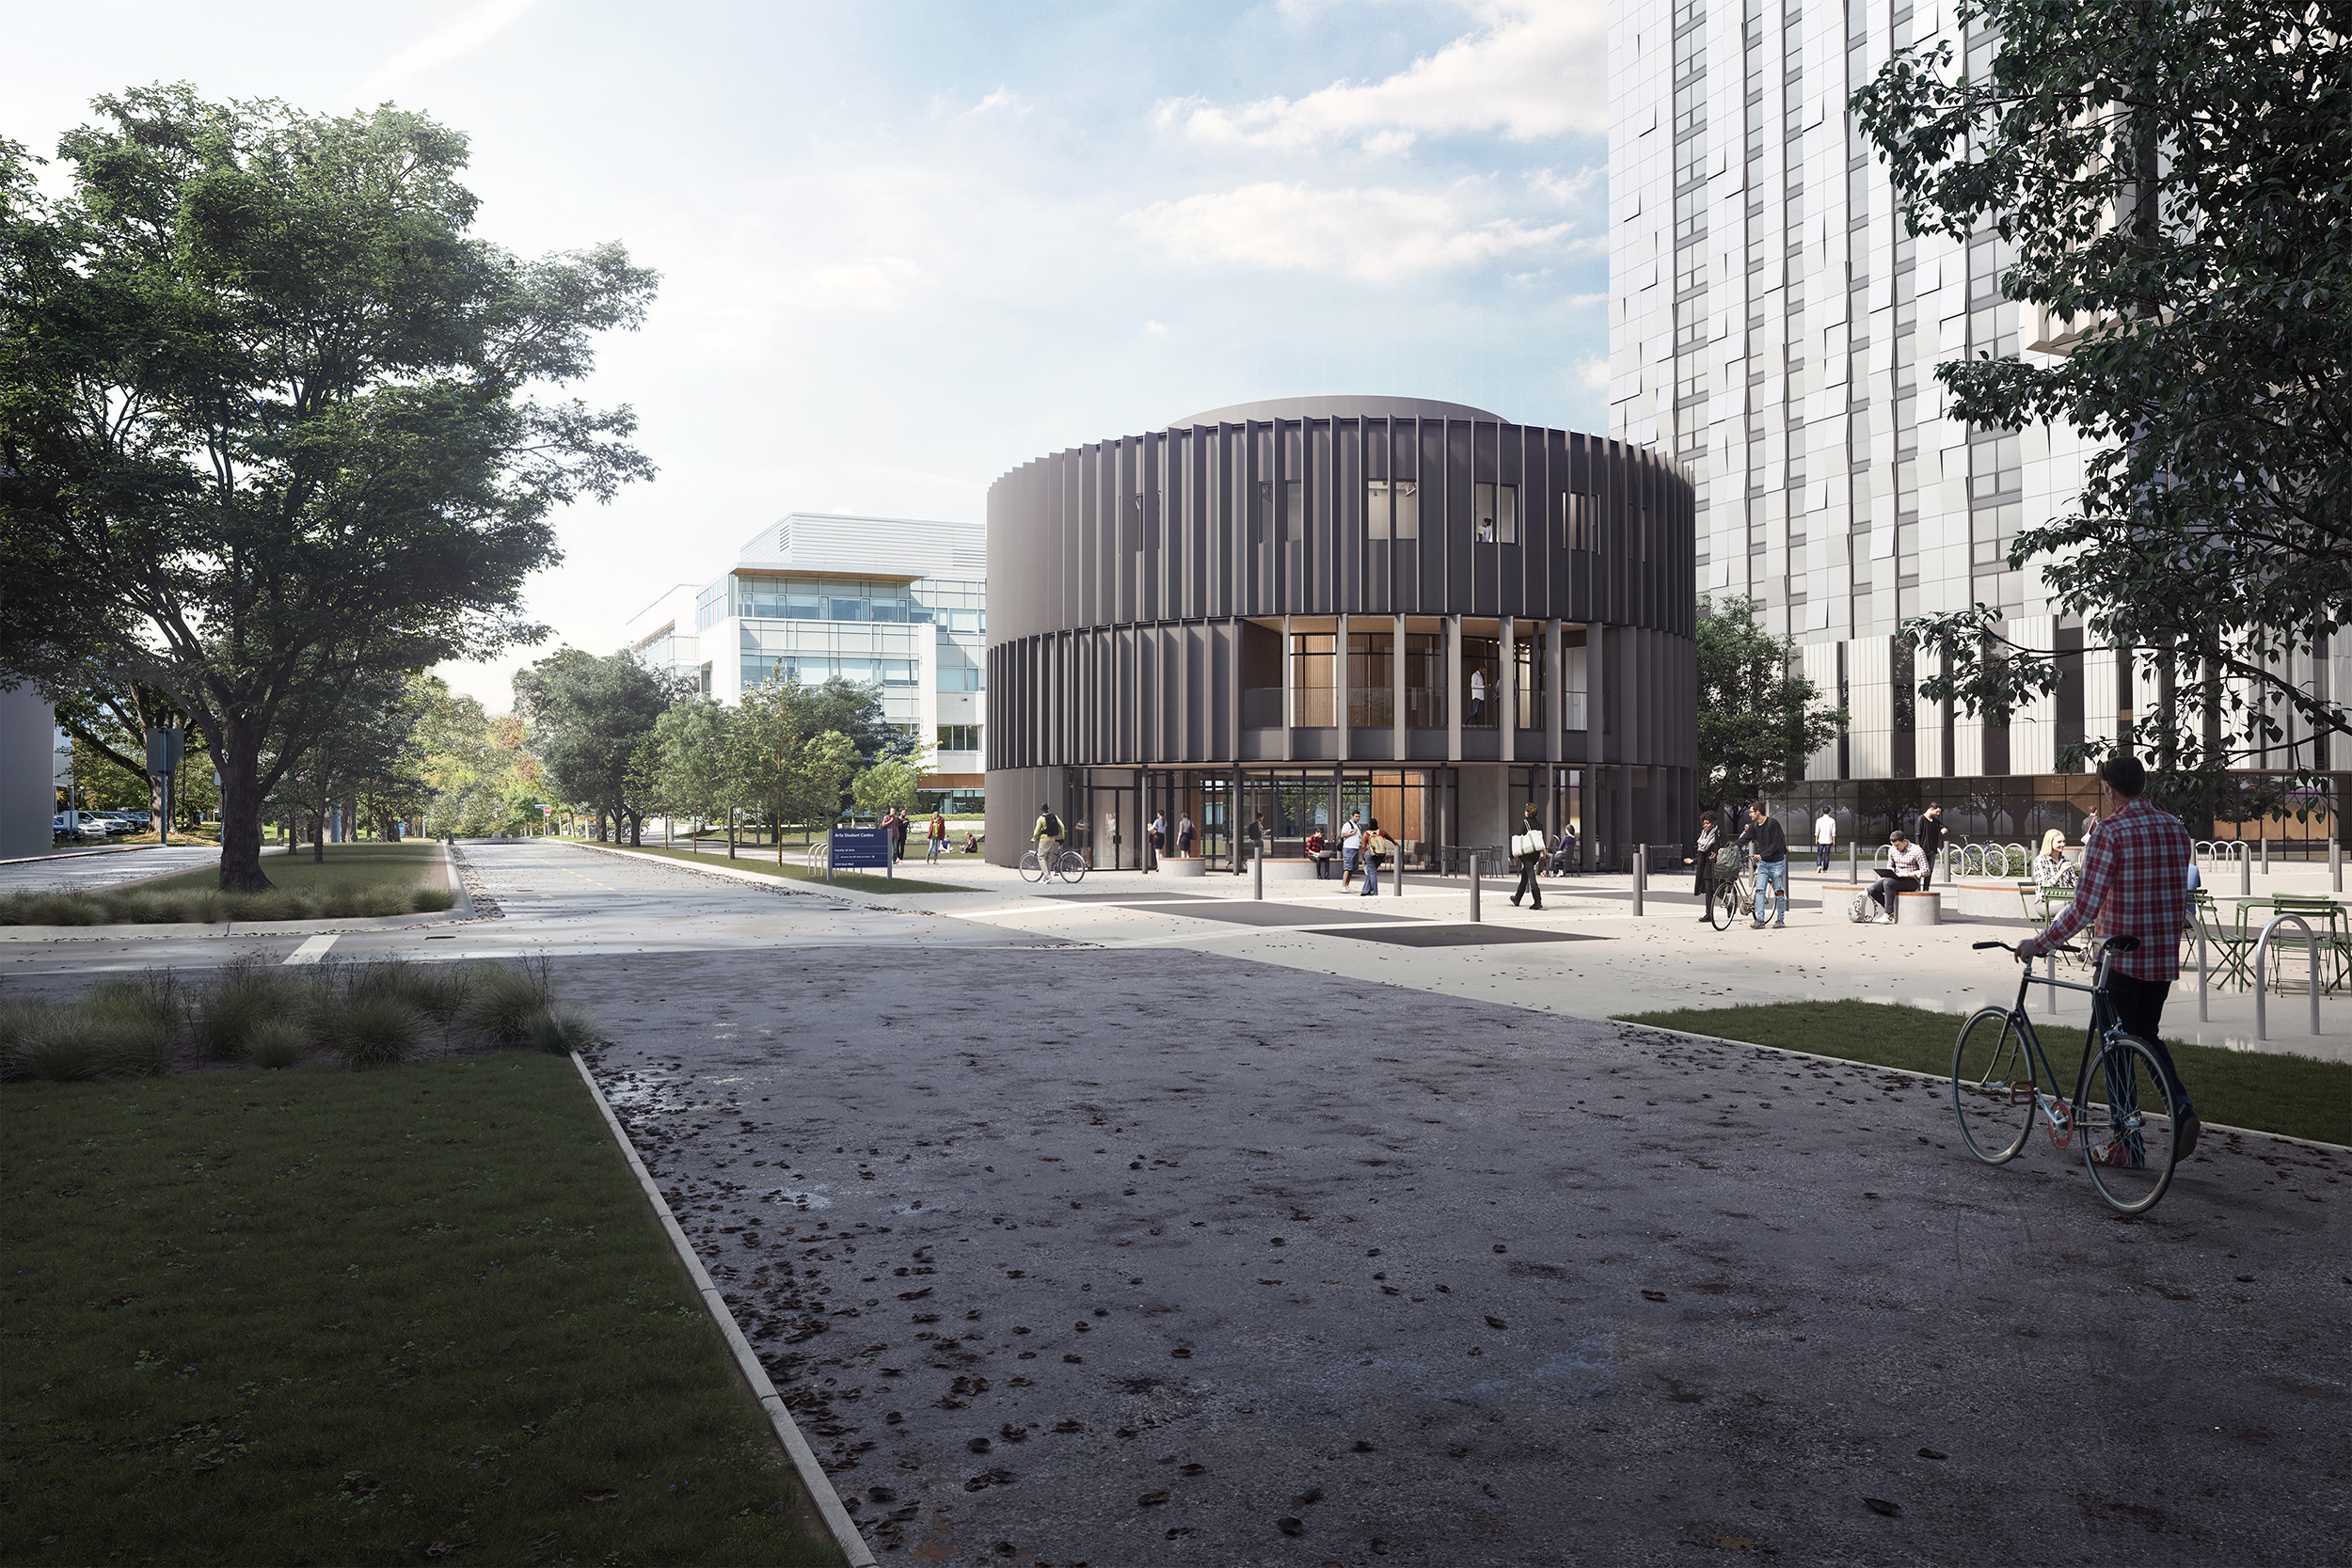 University of British Columbia Arts Student Centre | Leckie Studio Architecture + Design